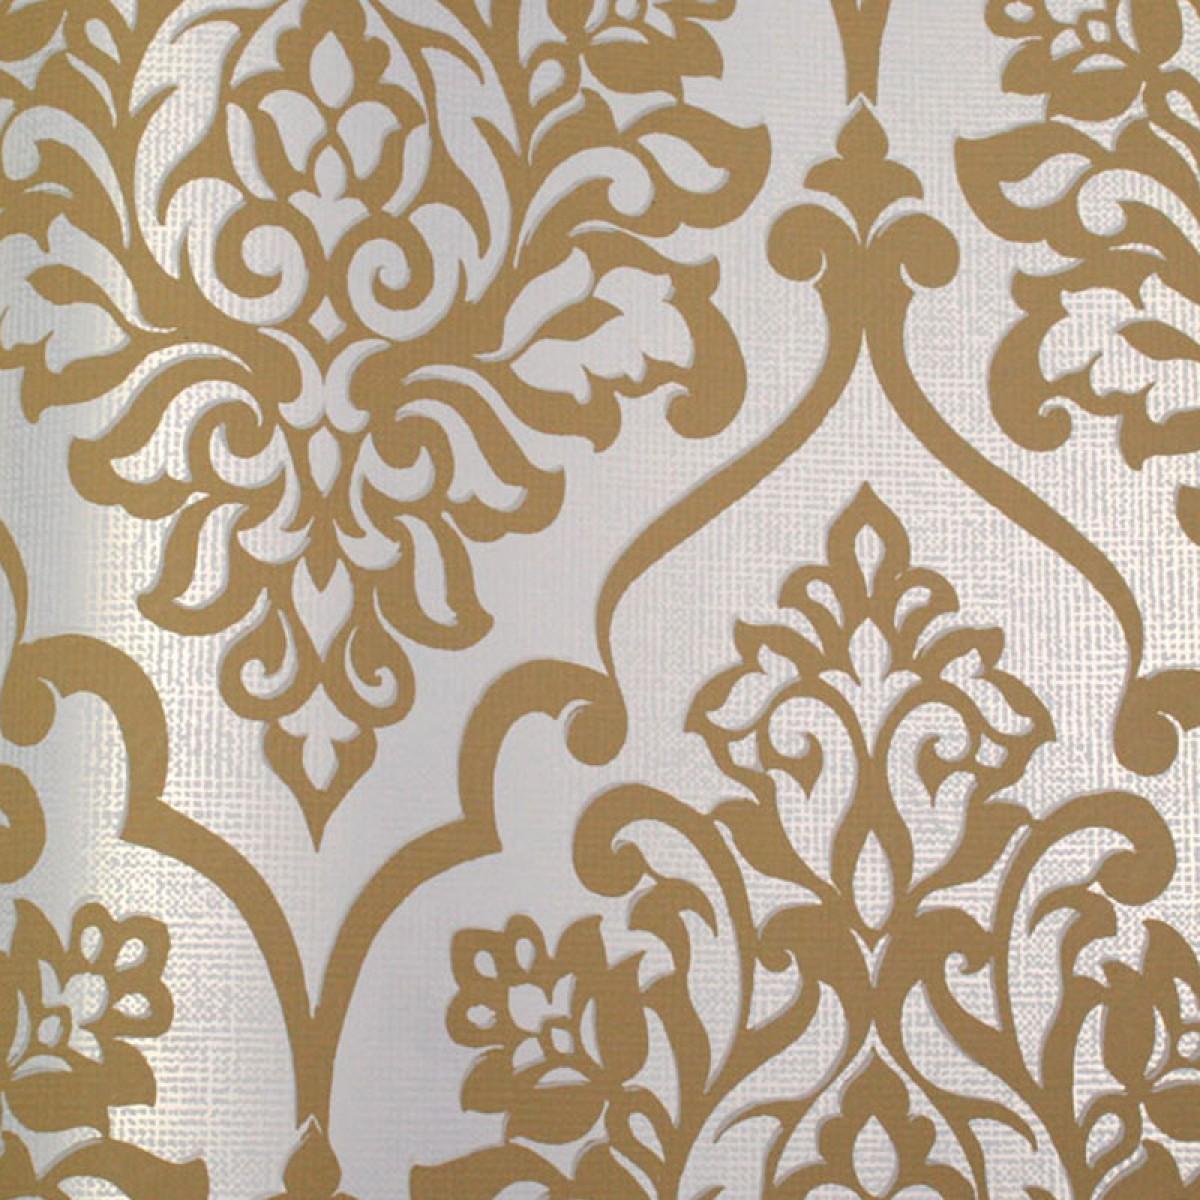 Metallic Gold and White Wallpaper - WallpaperSafari